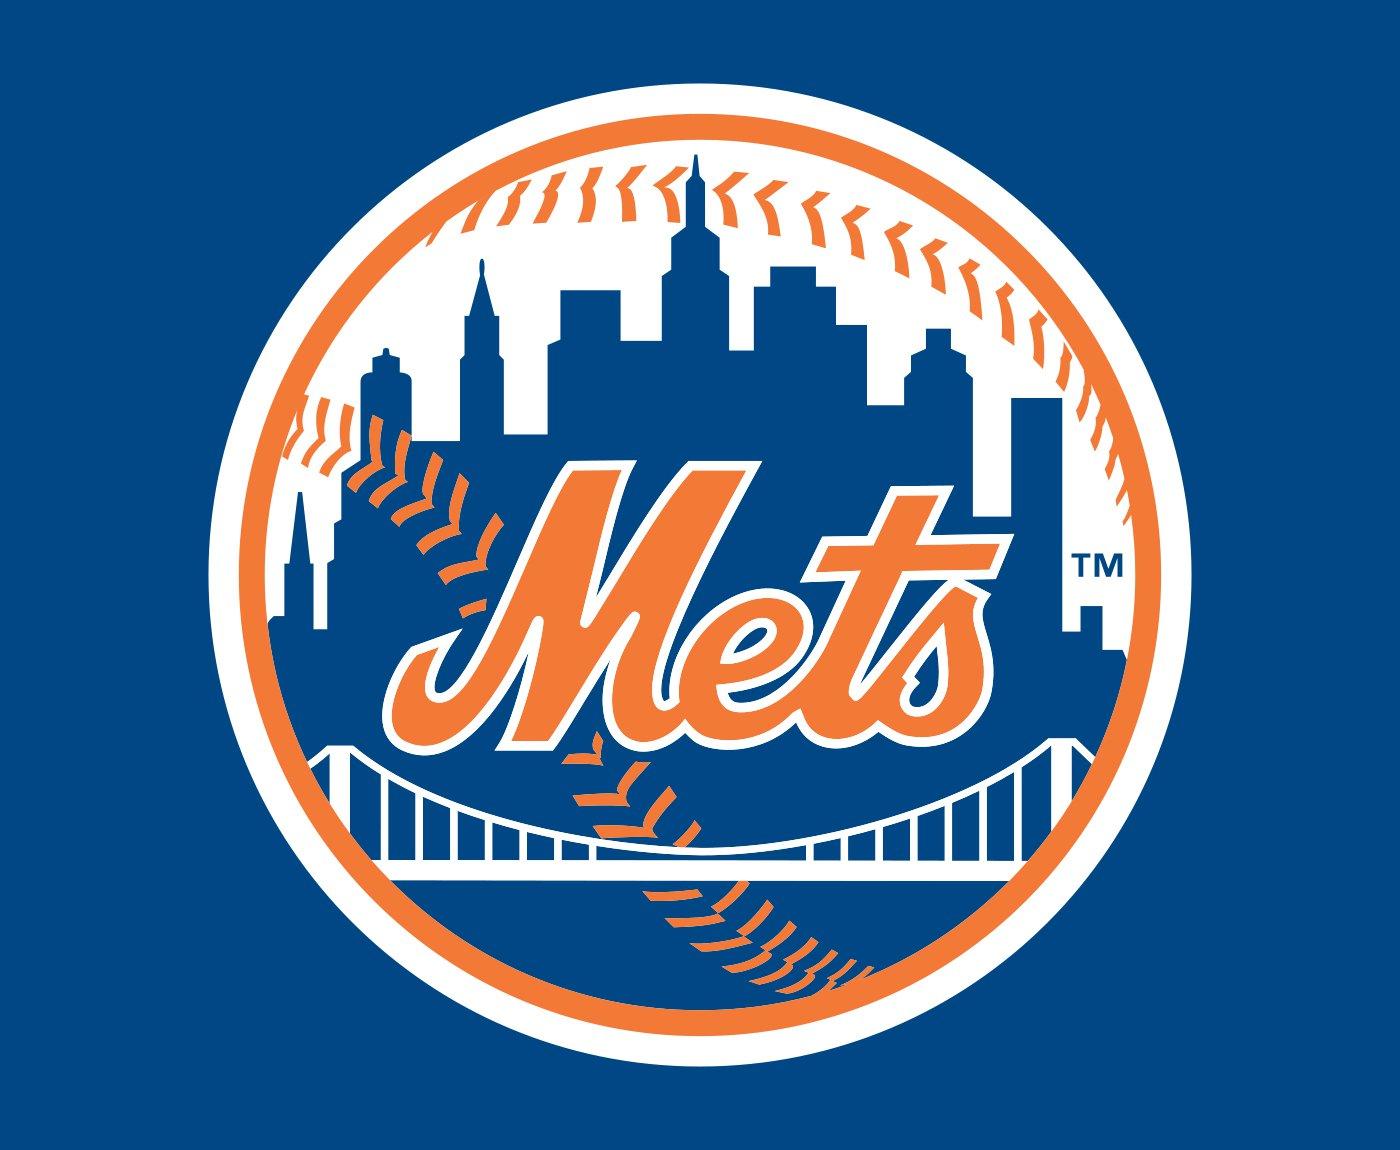 new york mets logo mets symbol meaning history and evolution rh 1000logos net mets logos pics mets logos free